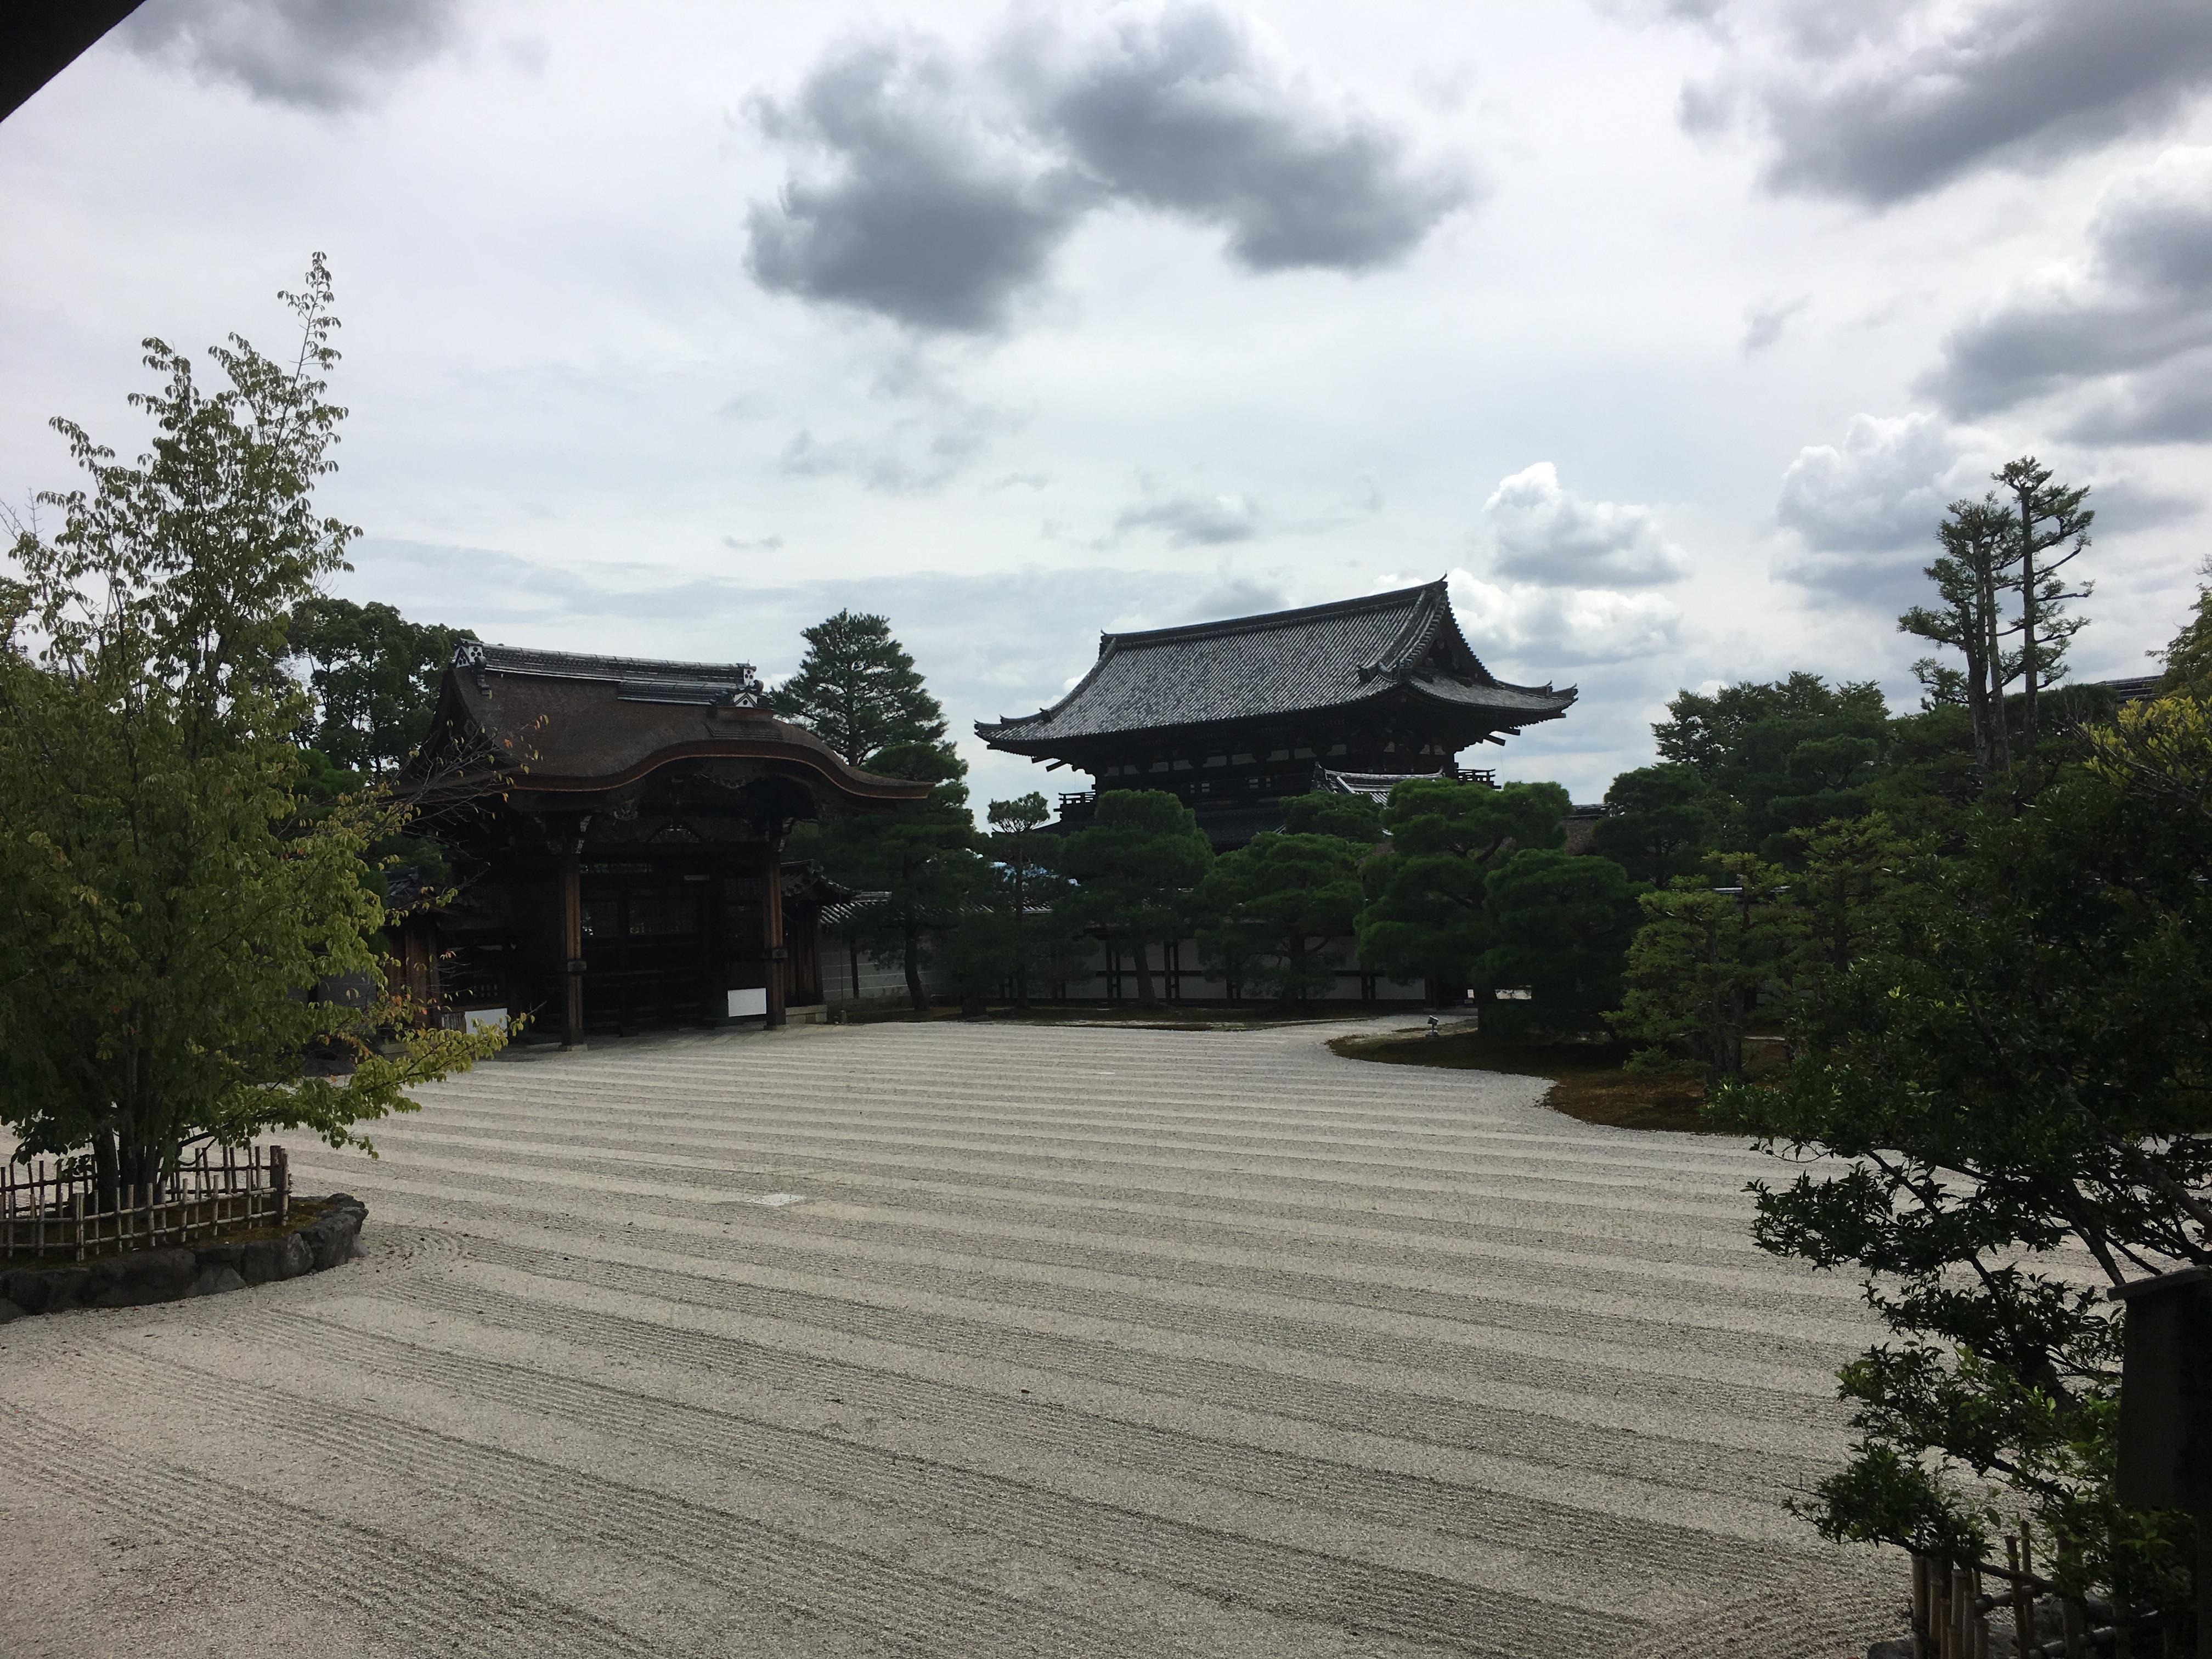 https://www.usagi-yado.com/blog/assets_c/IMG-6824.JPG